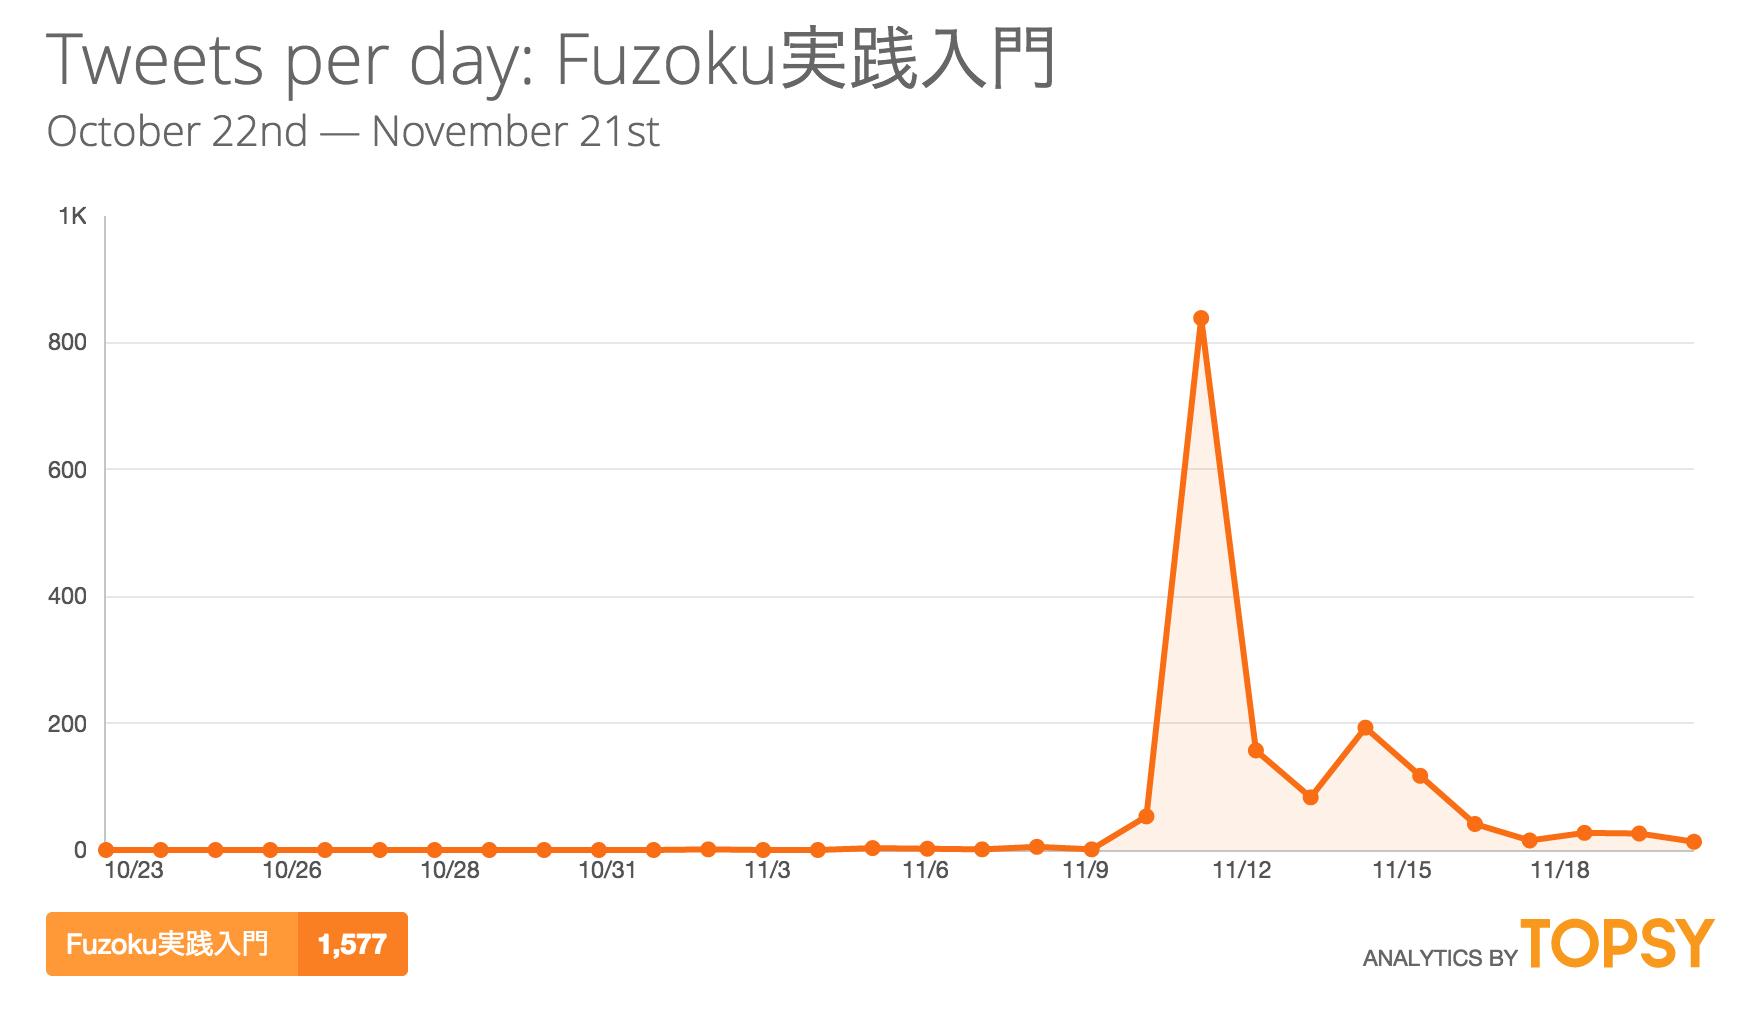 『Fuzoku実践入門』言及数 by Topsy